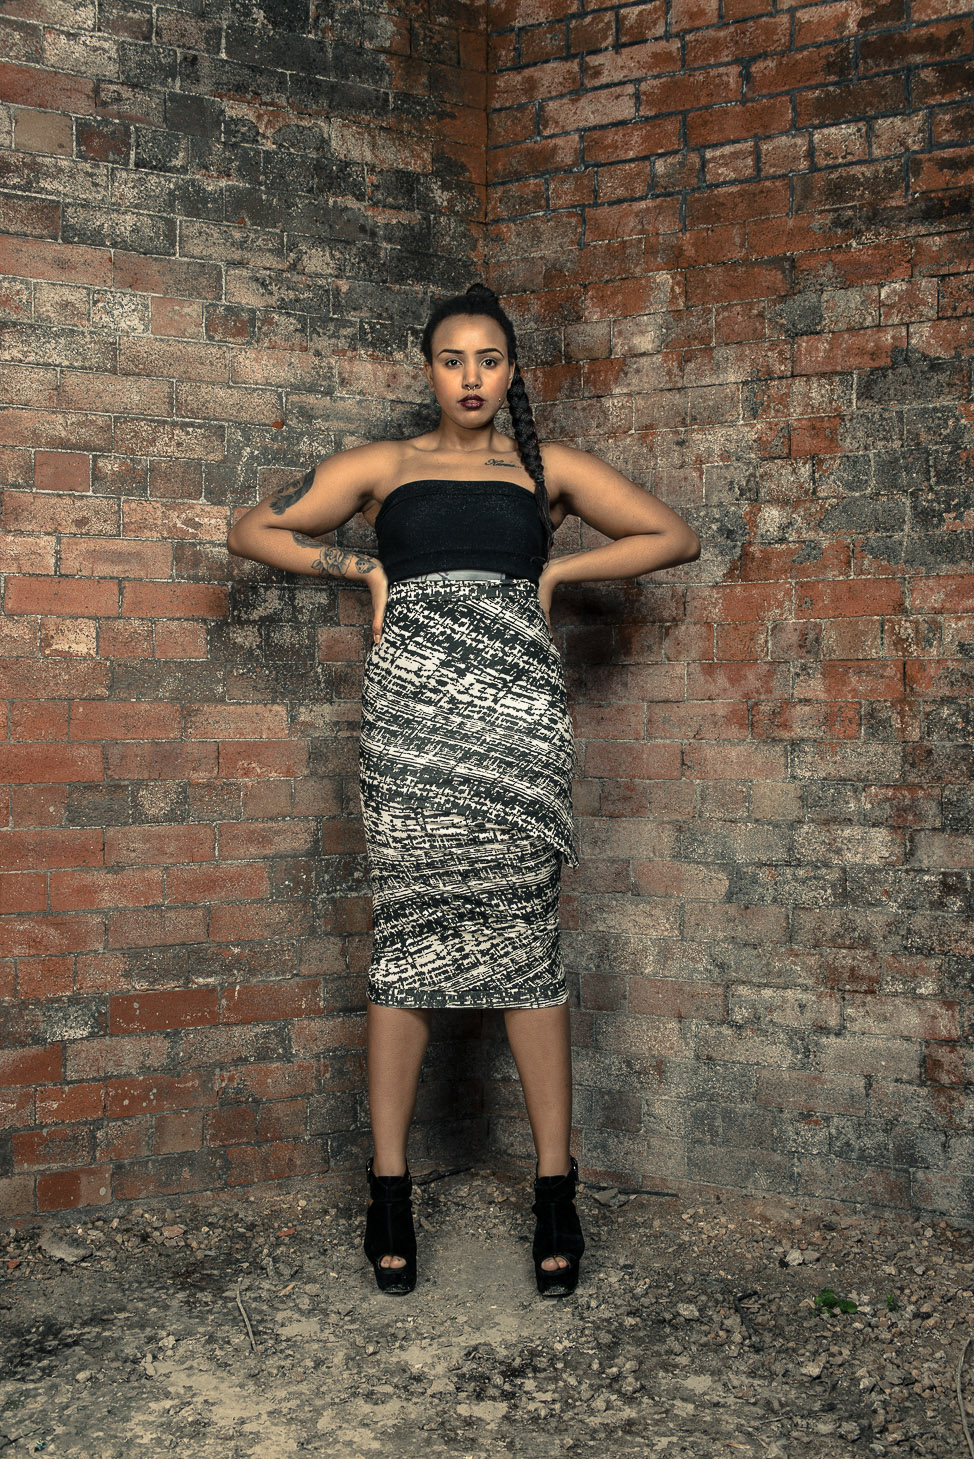 zaramia-ava-zaramiaava-leeds-fashion-designer-ethical-sustainable-tailored-minimalist-skirt-print-bandeau-maxi-versatile-drape-grey-bodysuit-black-obi-belt-wrap-cowl-styling-womenswear-models-35